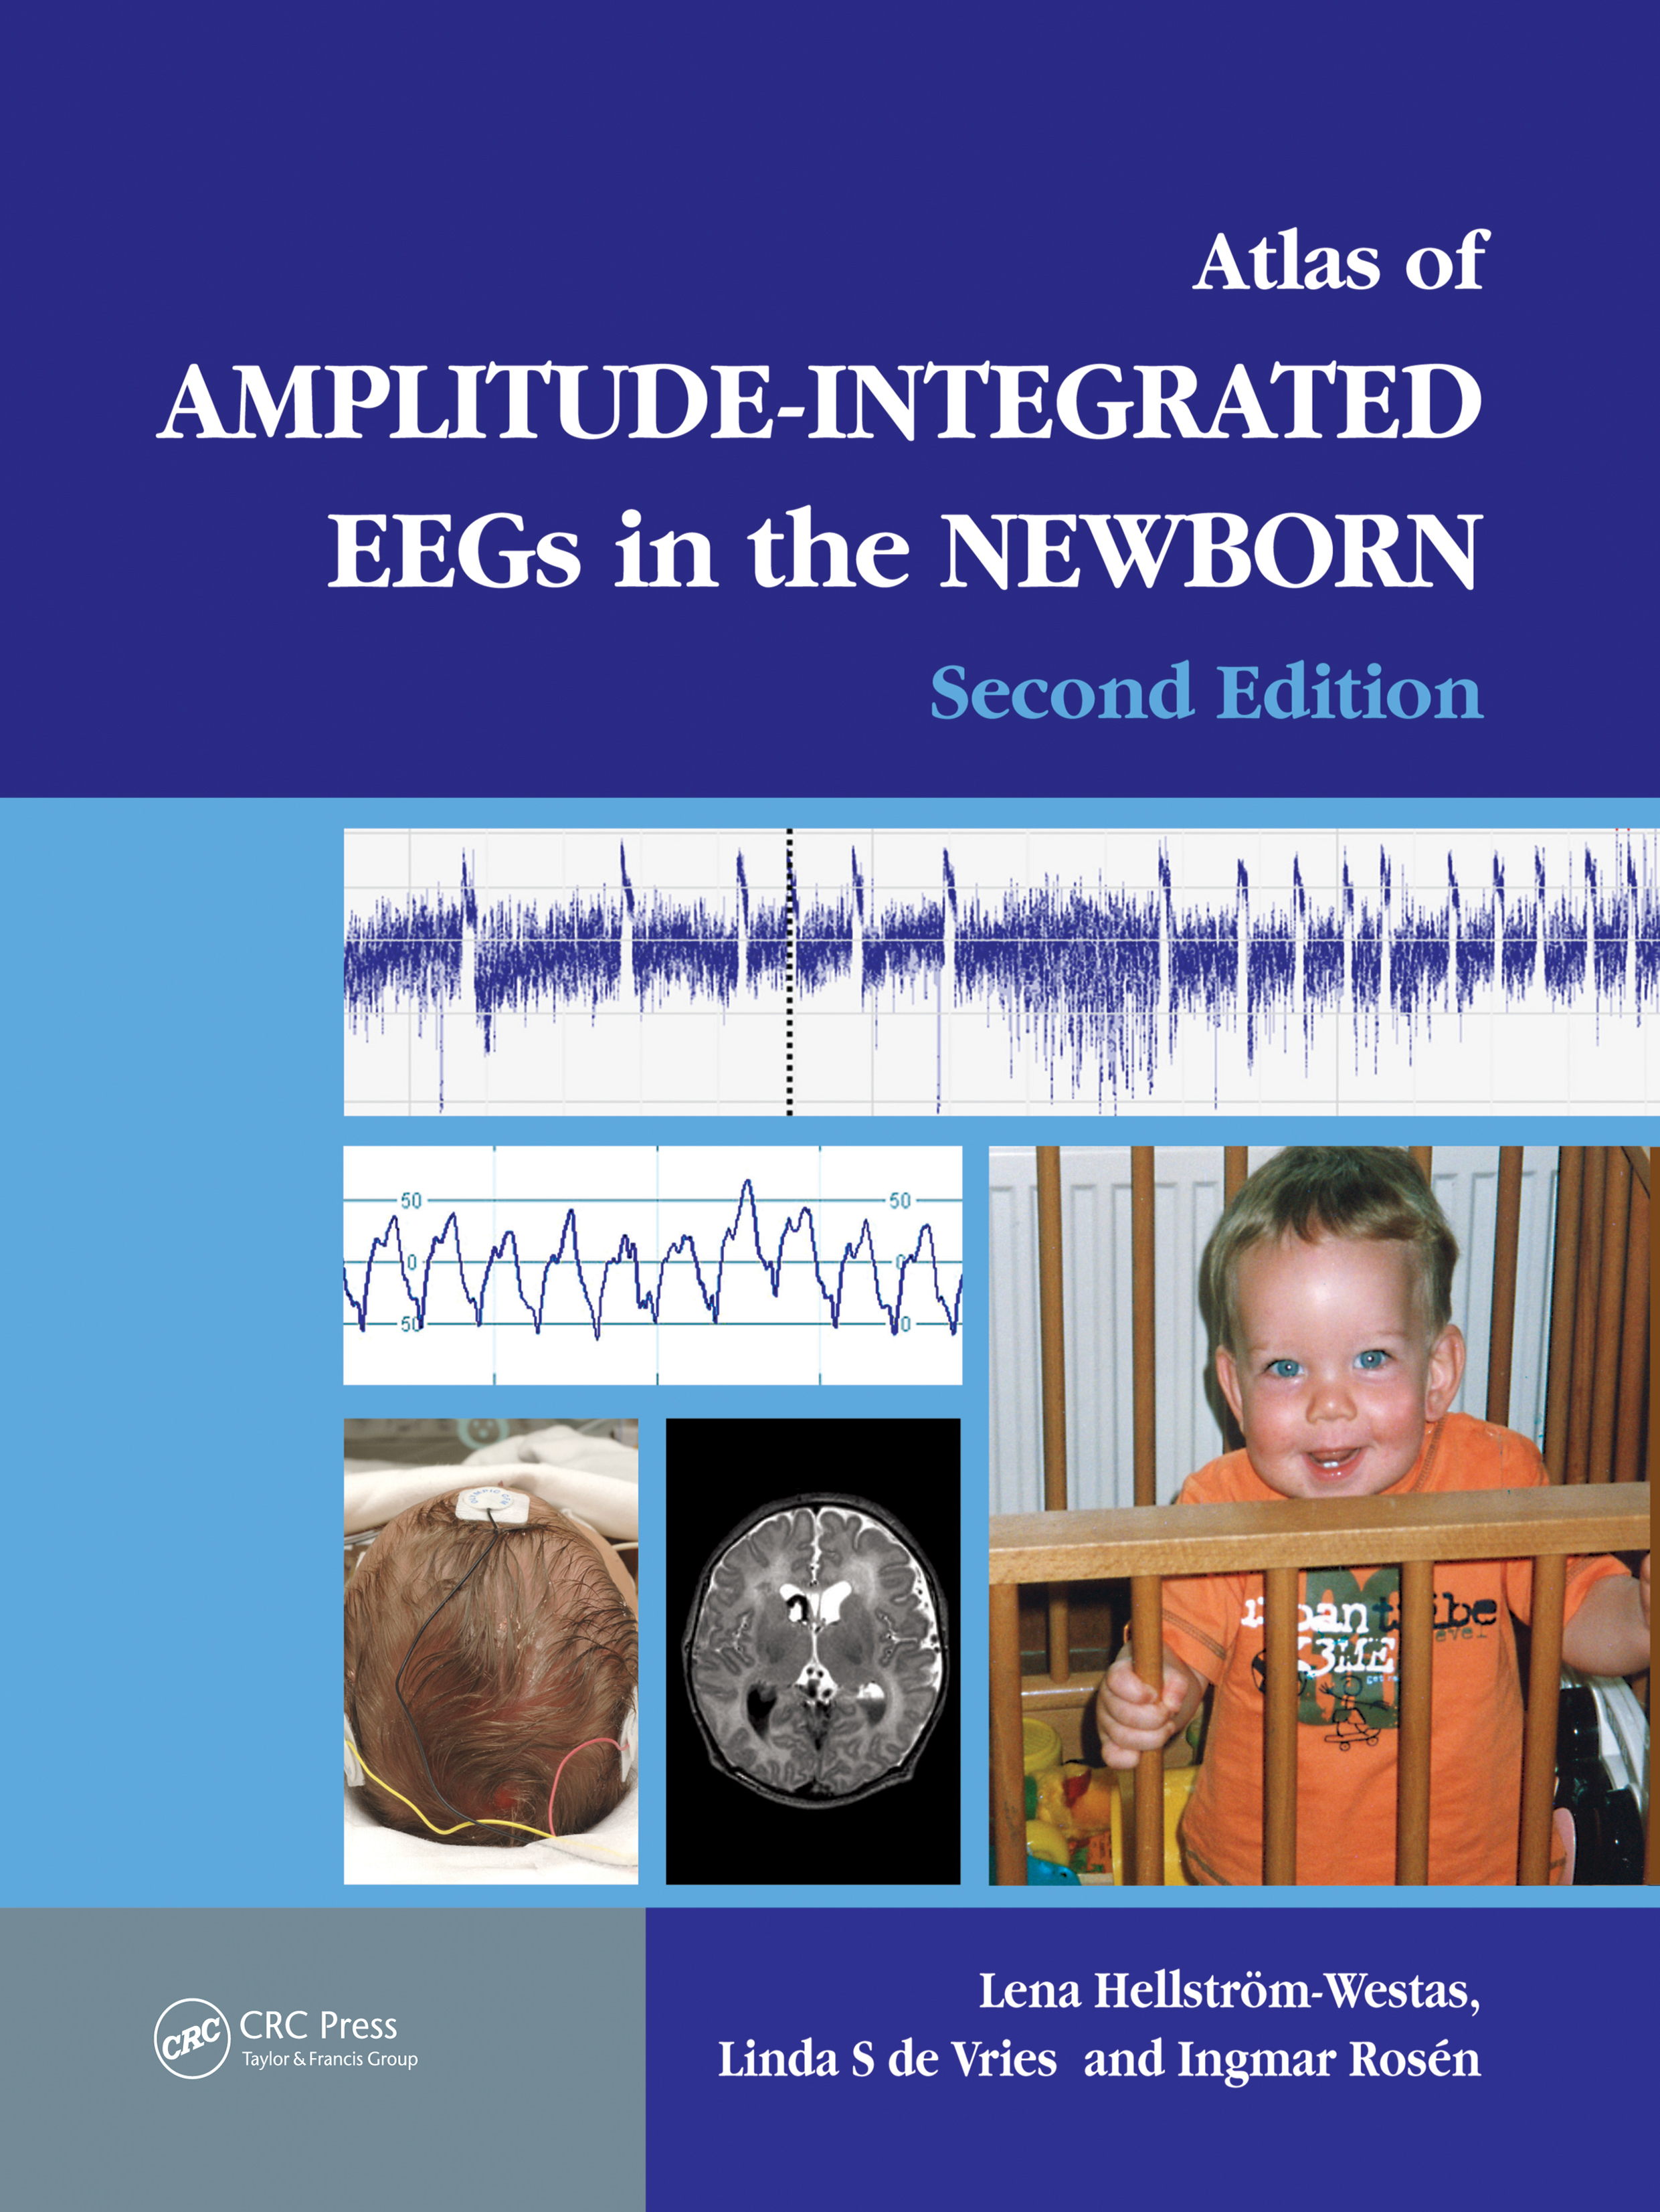 An Atlas of Amplitude-Integrated EEGs in the Newborn